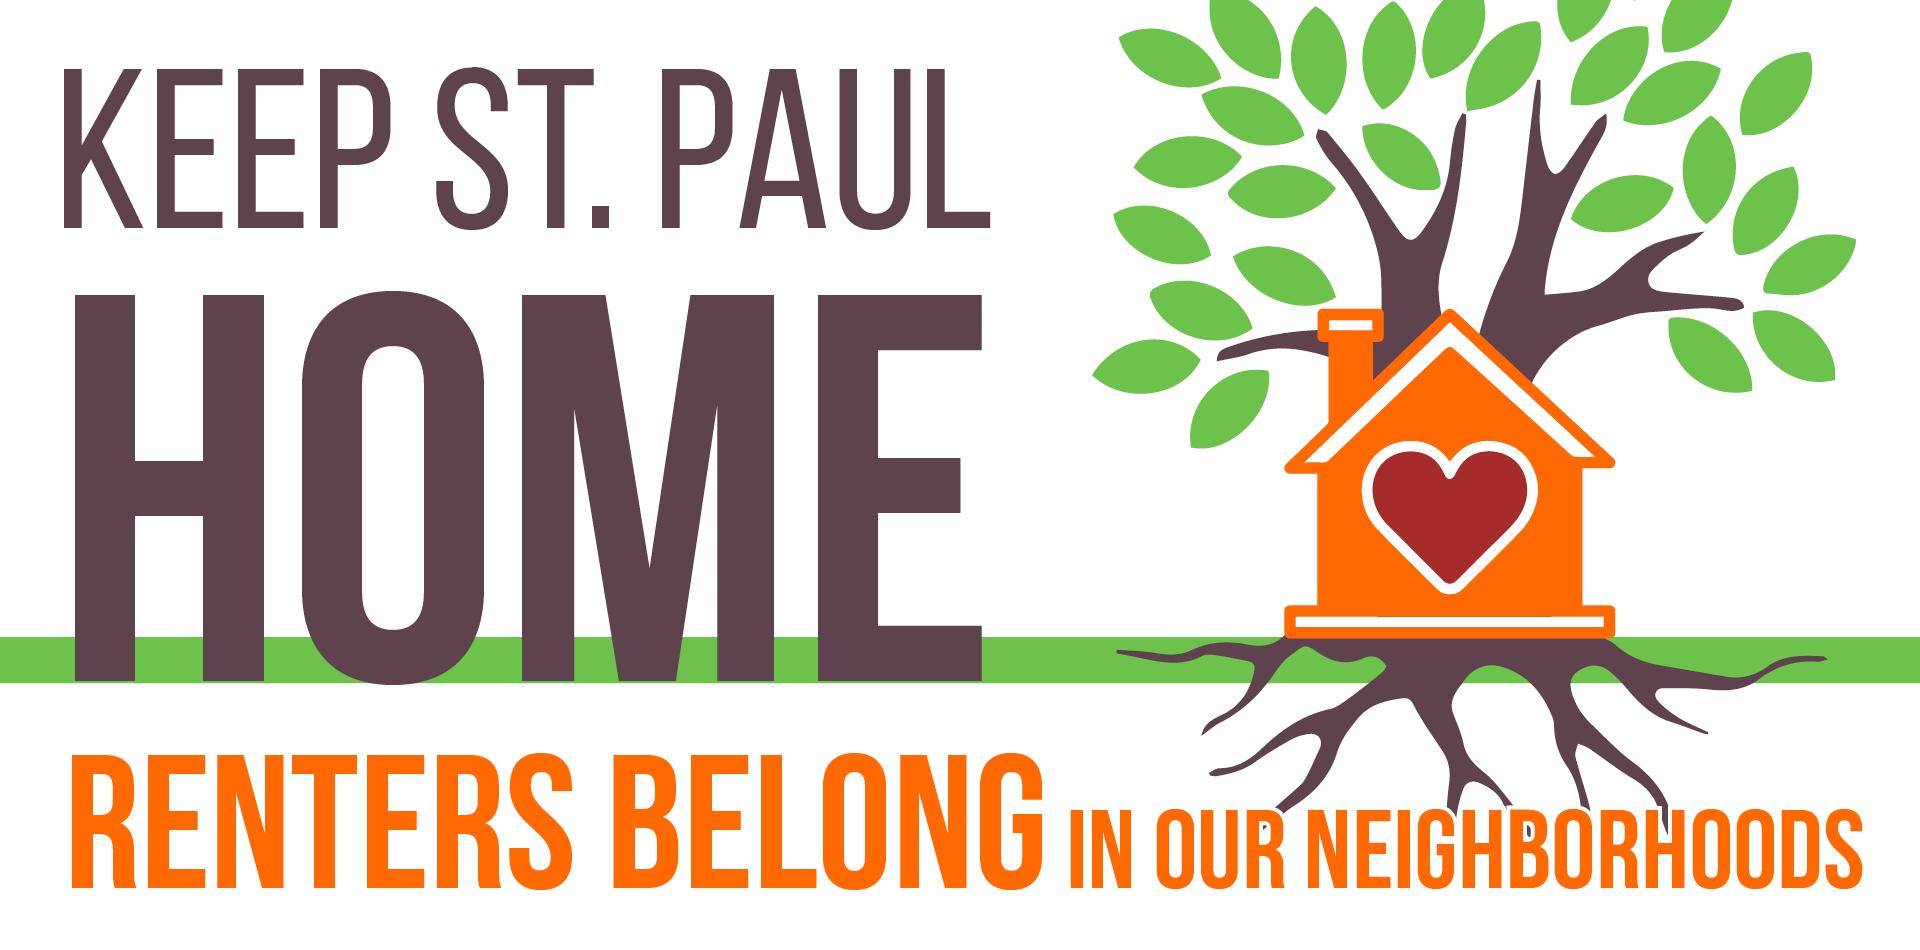 keep st paul home logo